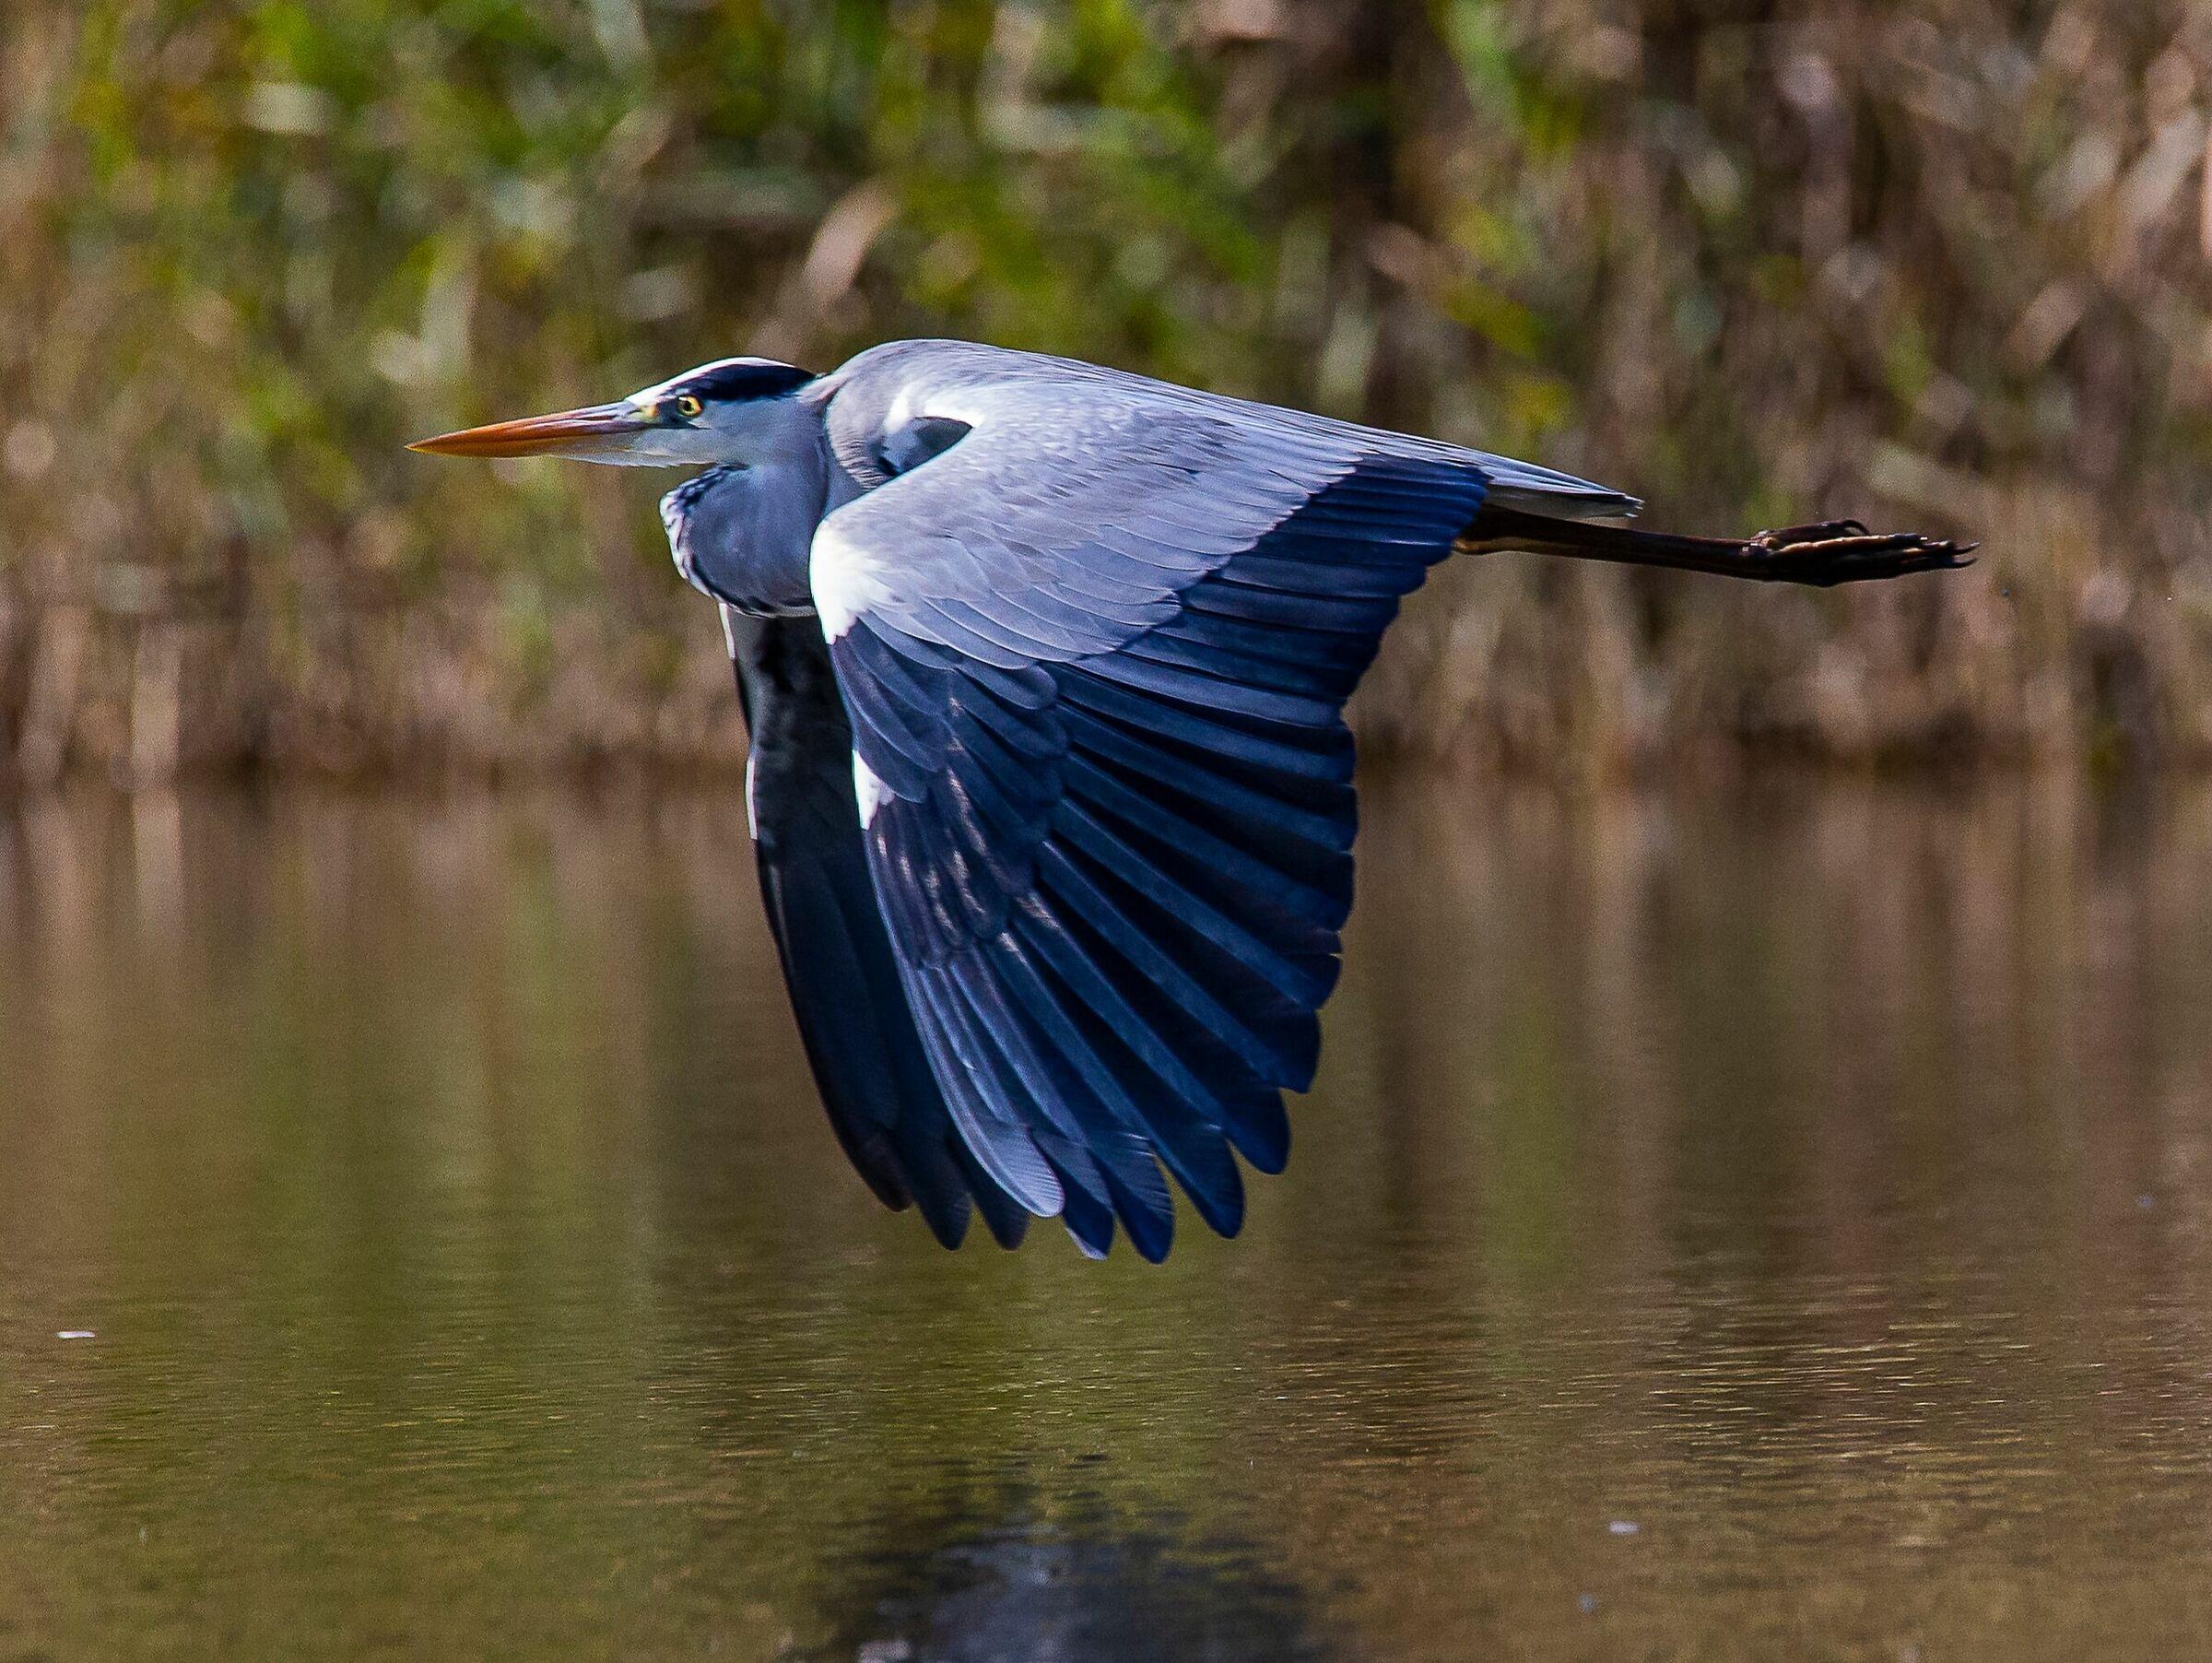 Ash heron in flight...